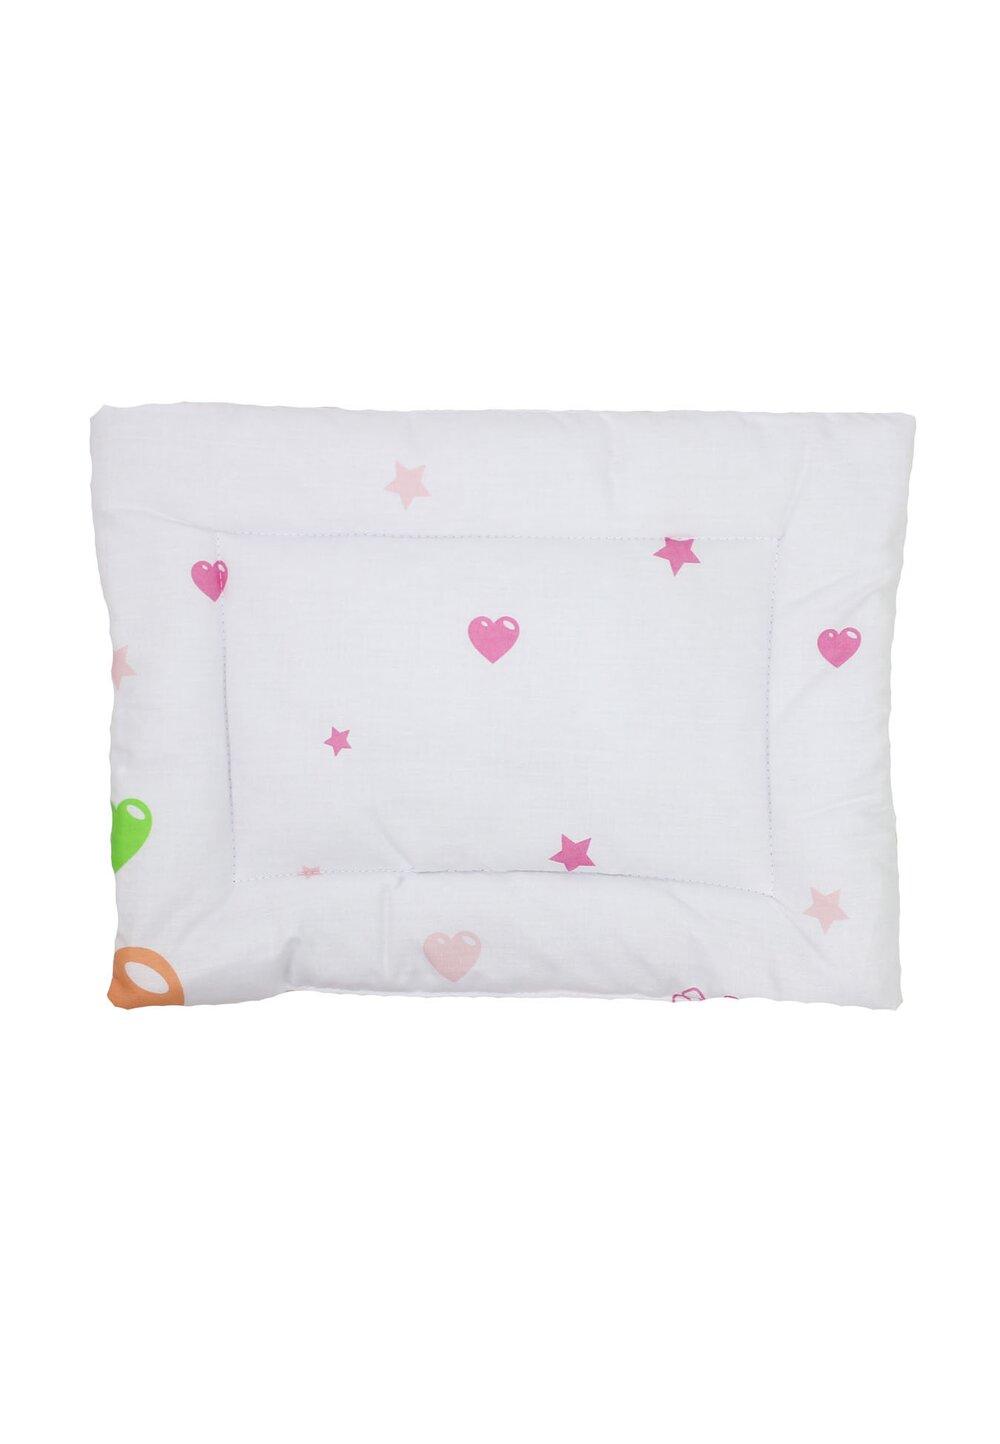 Perna slim, alba,inimioare cu stelute roz, 37 x 28 cm imagine